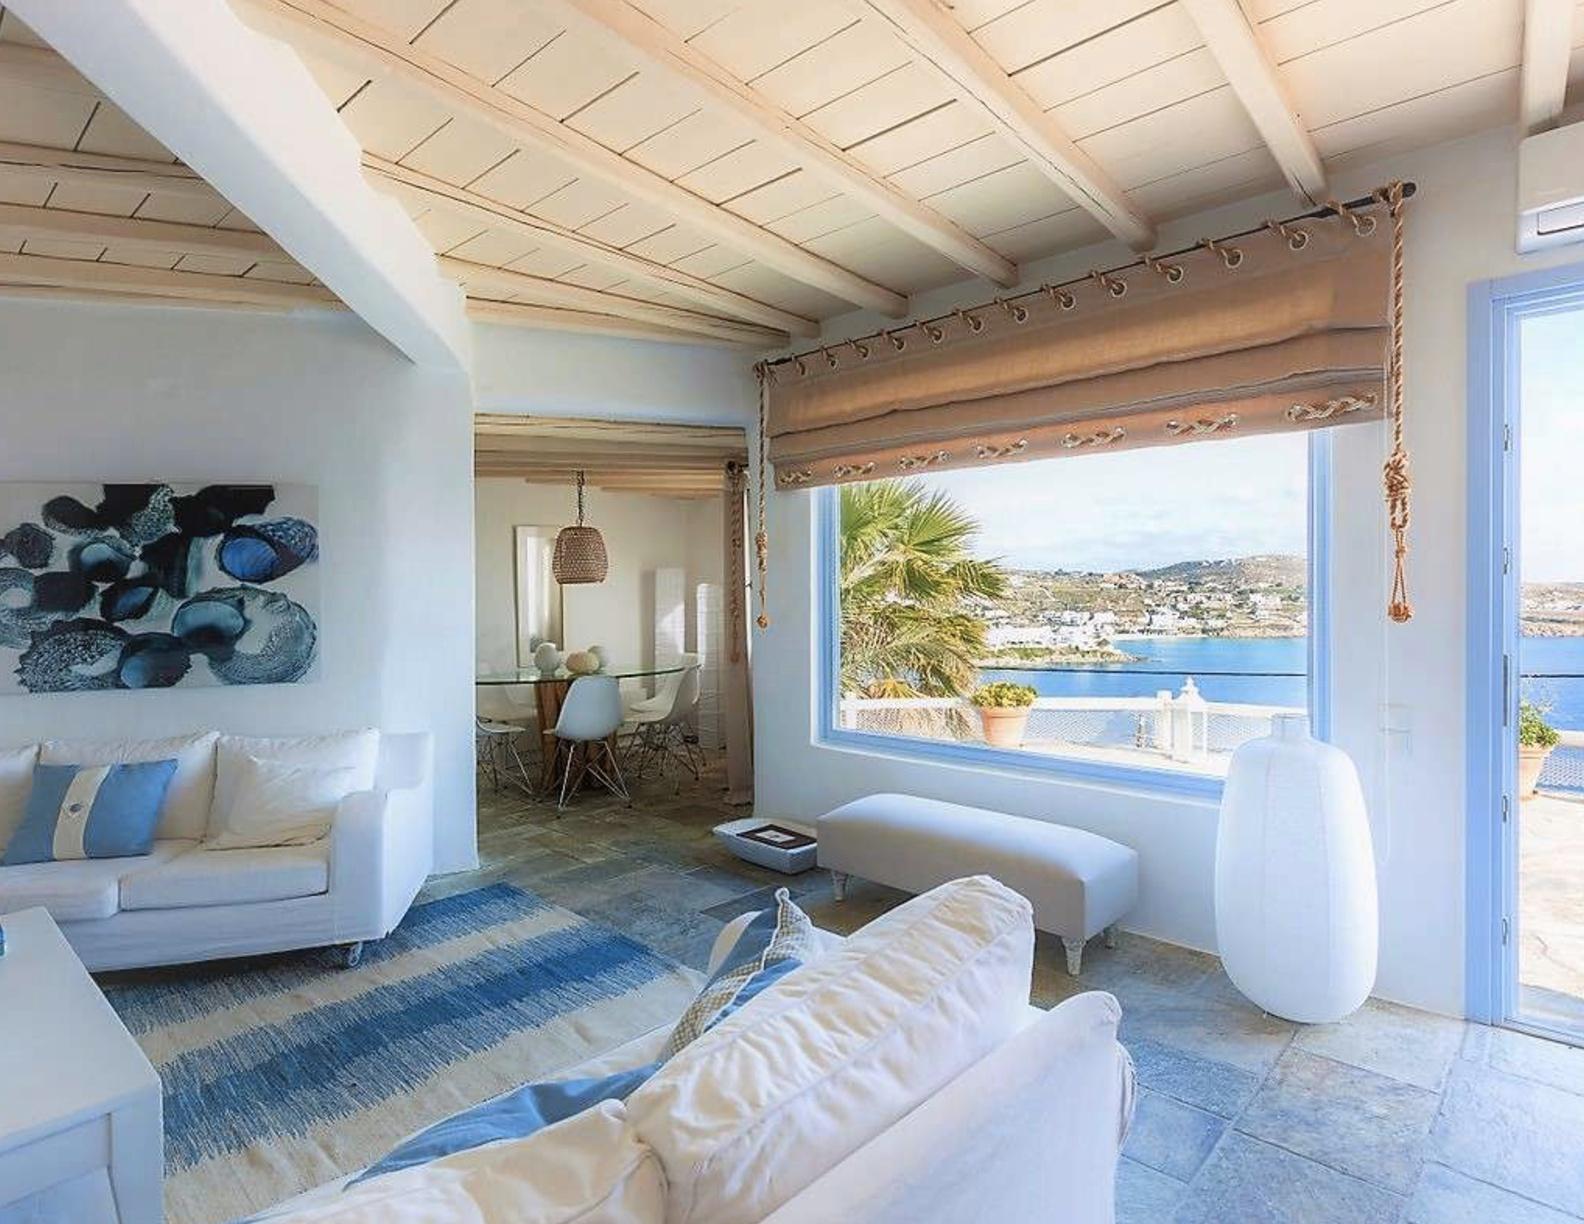 Villa-Abbi,-Mykonos-ilovepdf-compressed-010